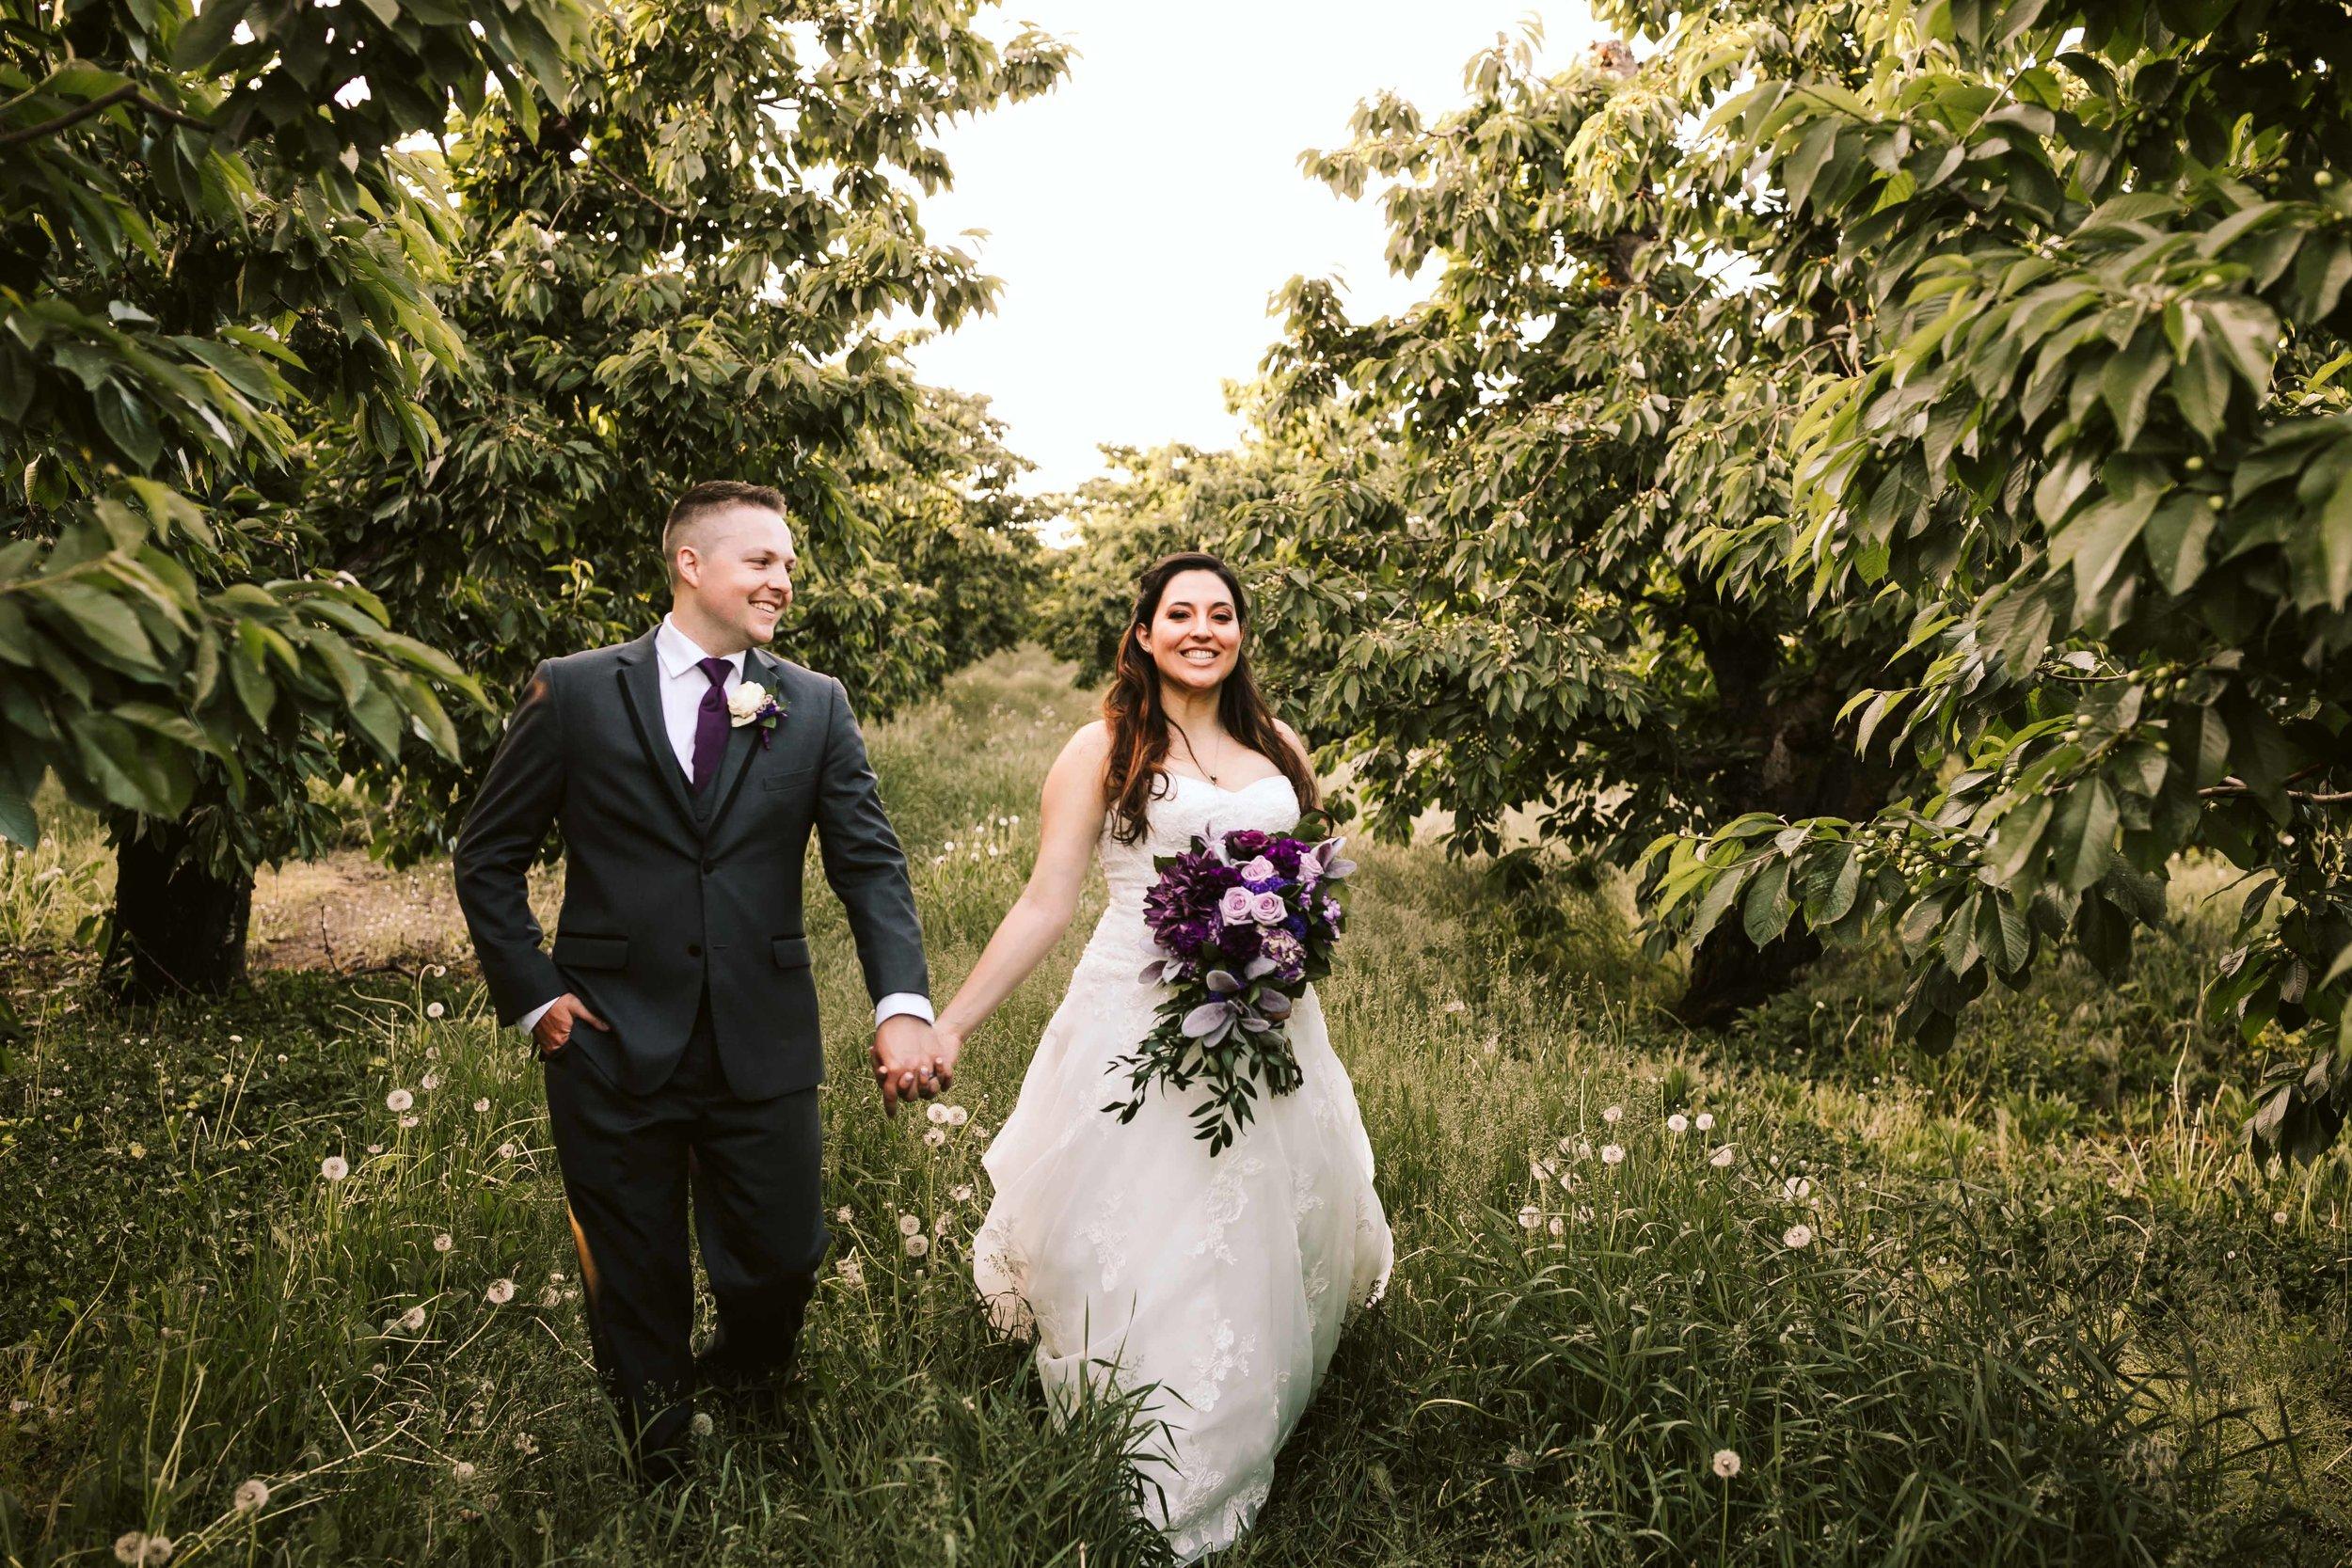 tuncannon-cellars-wedding-118.jpg